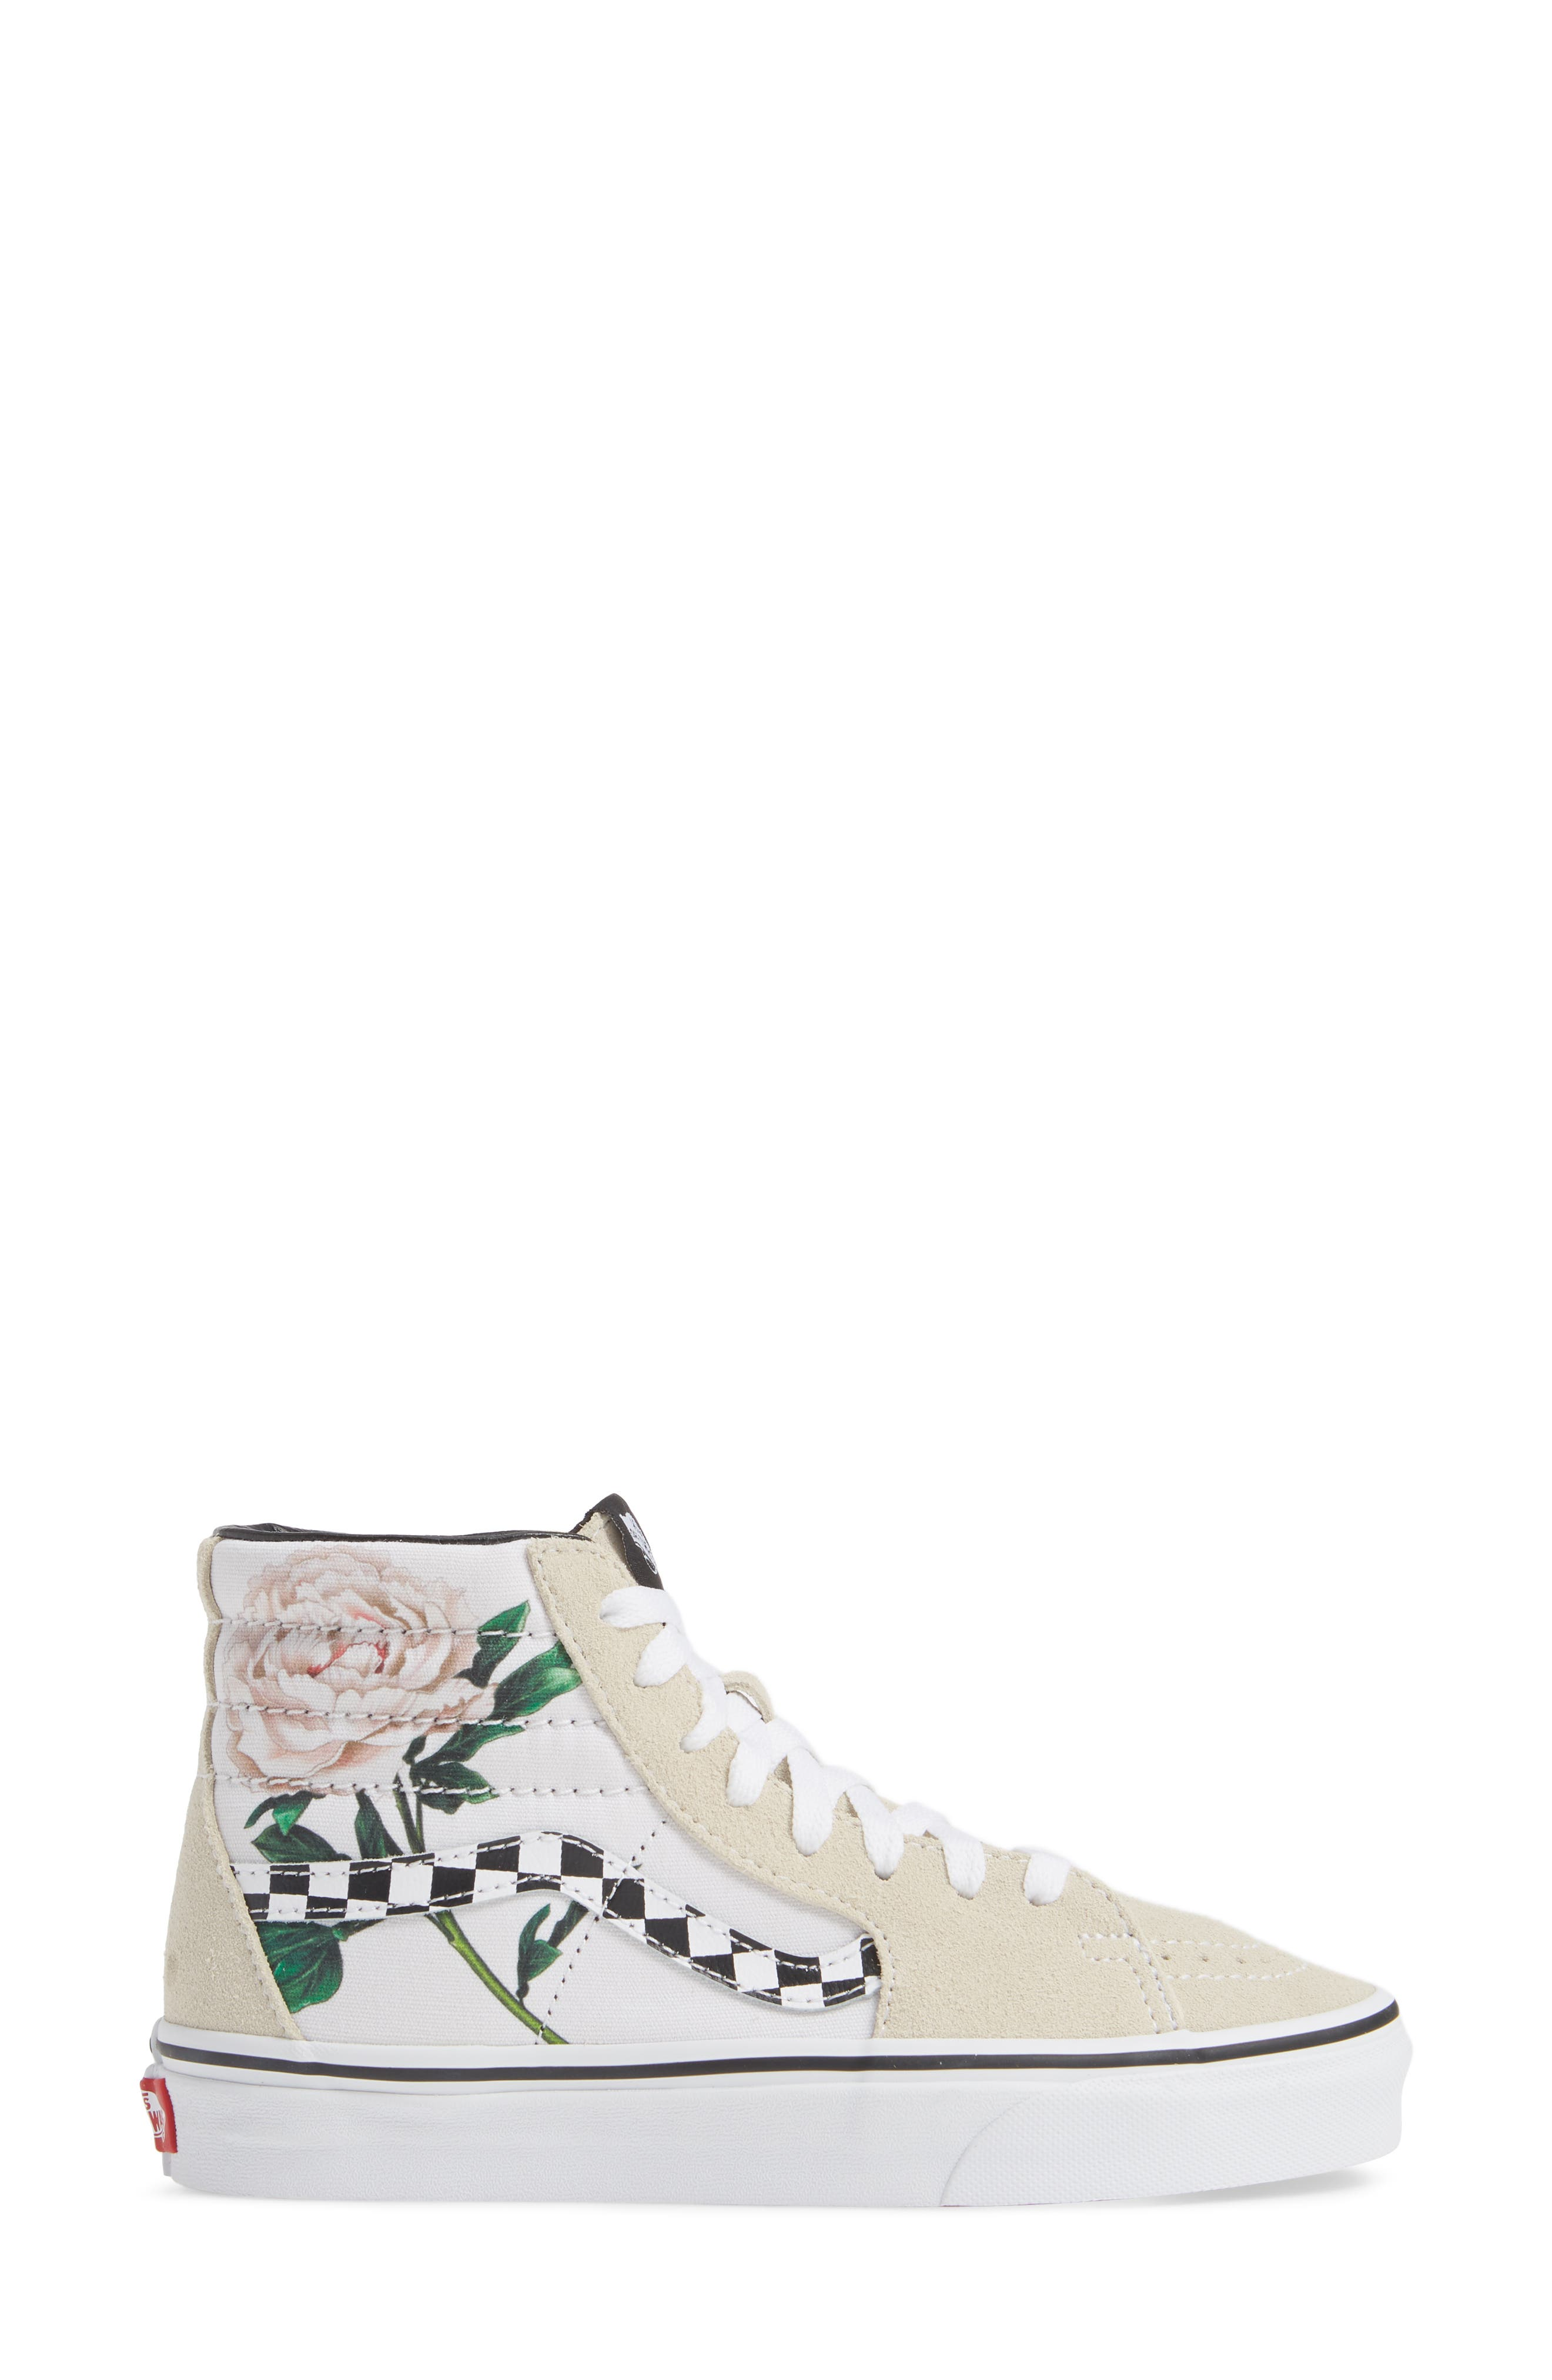 VANS,                             Sk8-Hi Checker Floral High Top Sneaker,                             Alternate thumbnail 3, color,                             CHECKER FLORAL TURTLEDOVE